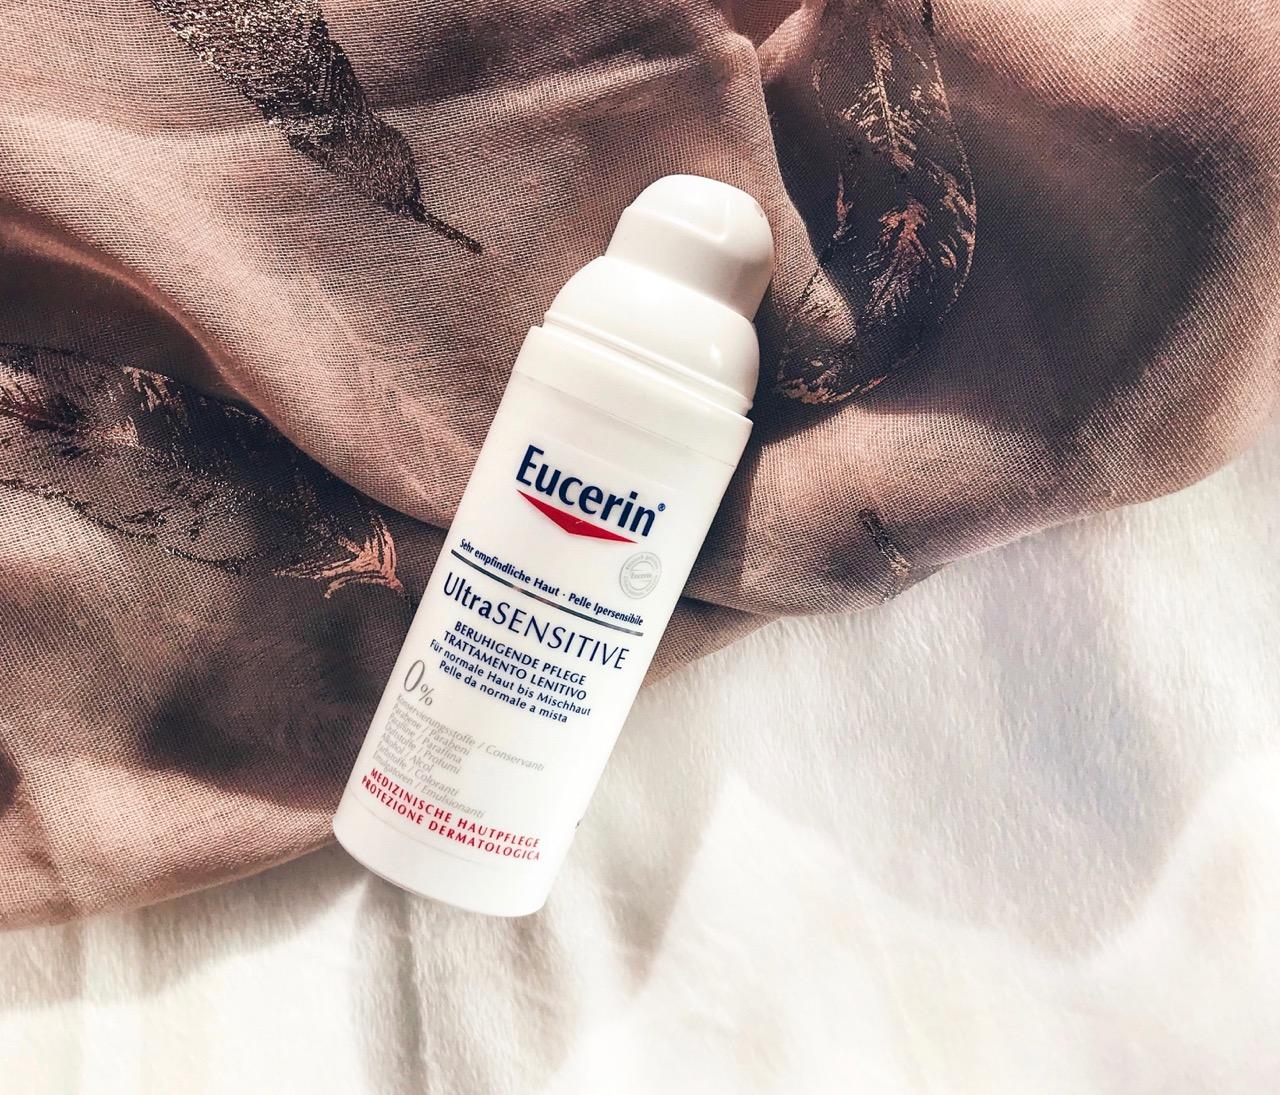 Eucerin Ultra Sensitive Beruhigende Pflege ausprobiert